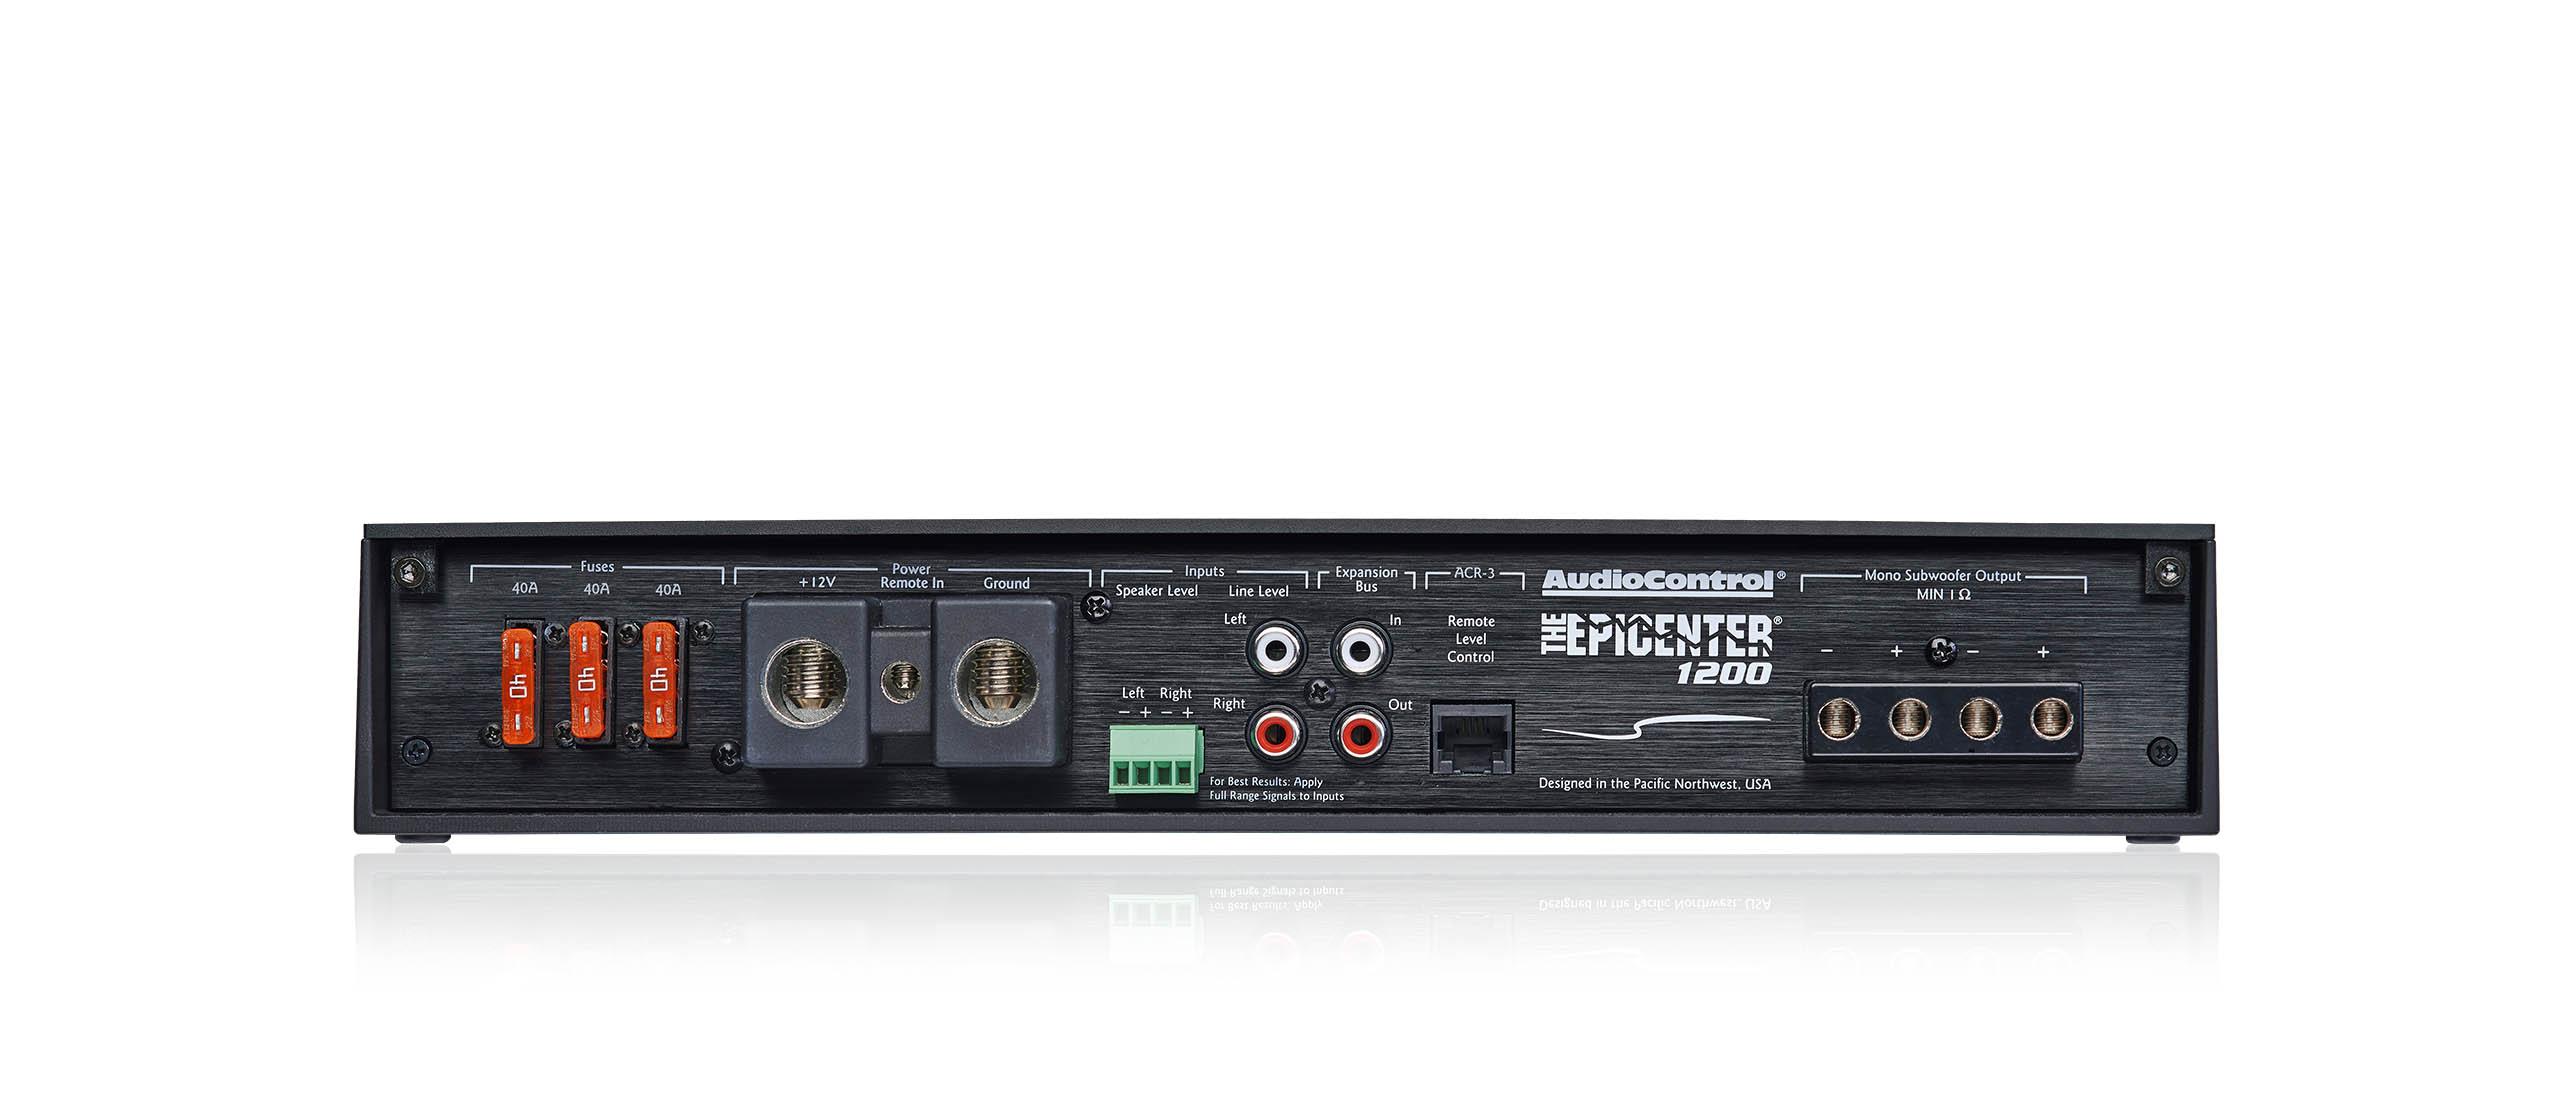 The Epicenter 1200 Audiocontrol 4 Channel Speaker Wiring Diagram Epic 400 Watts Full Range